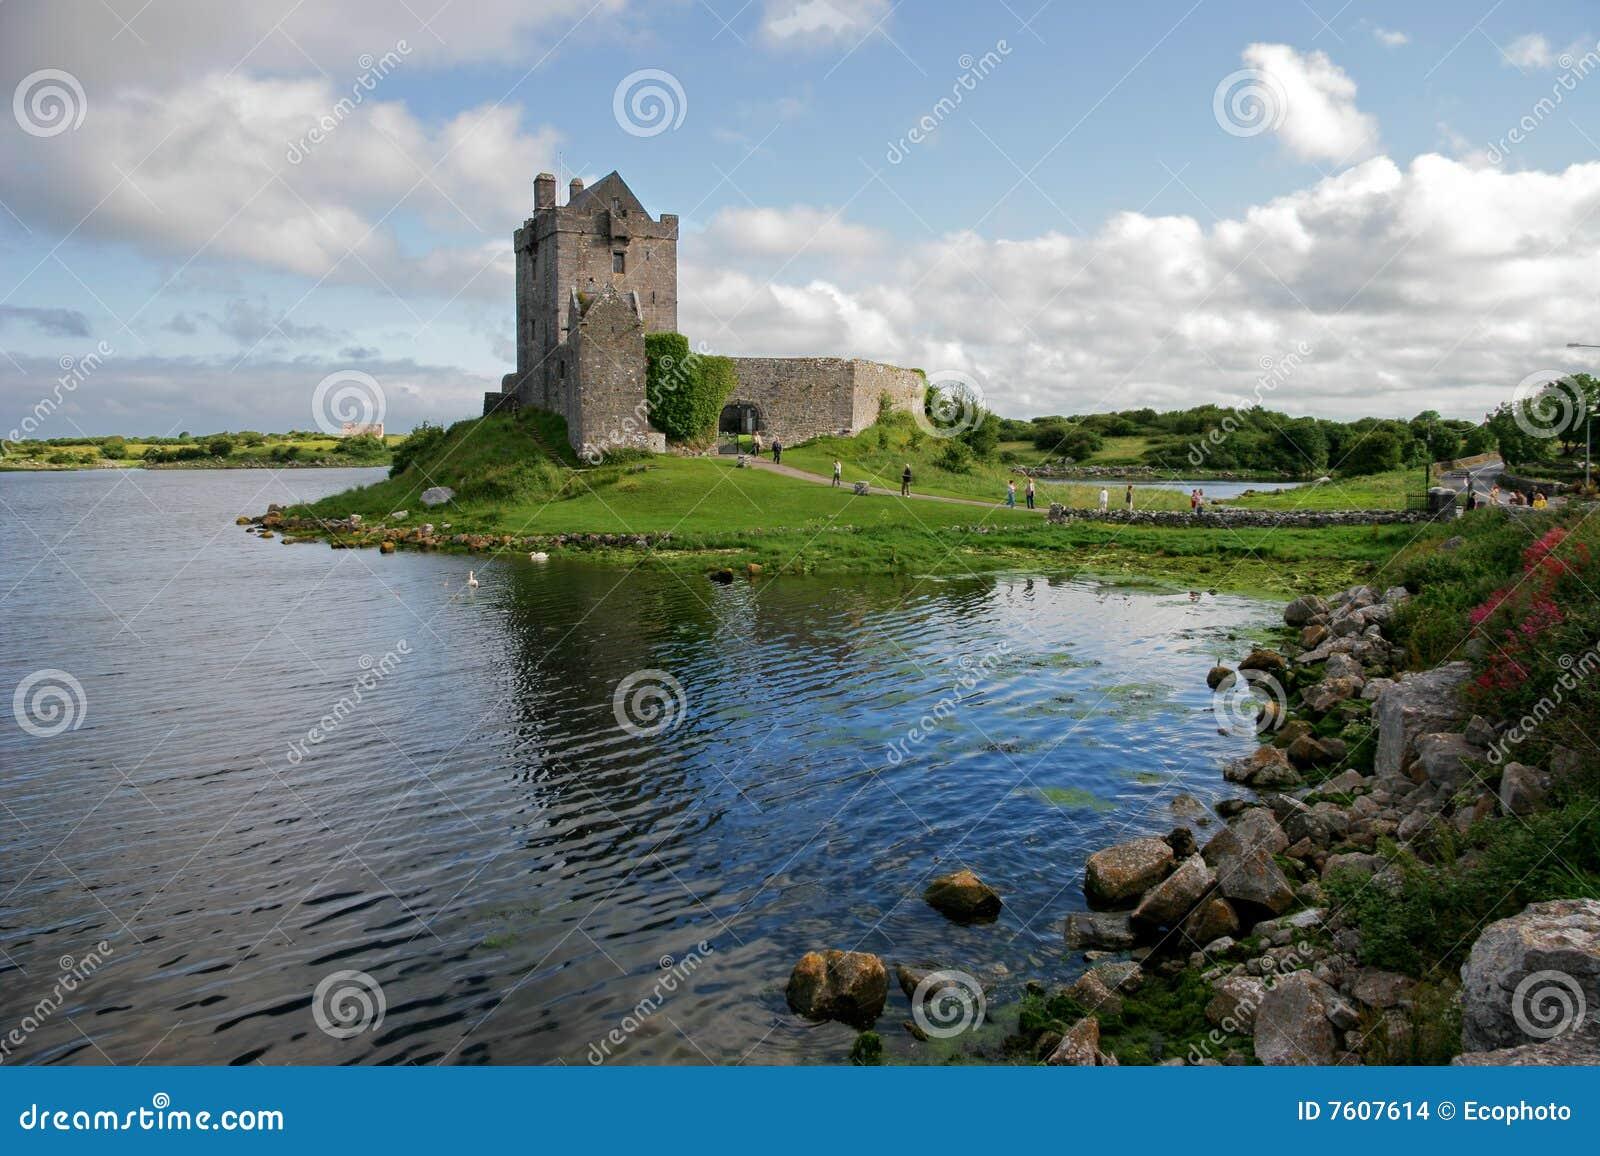 Castelo de Dunguaire. Ireland